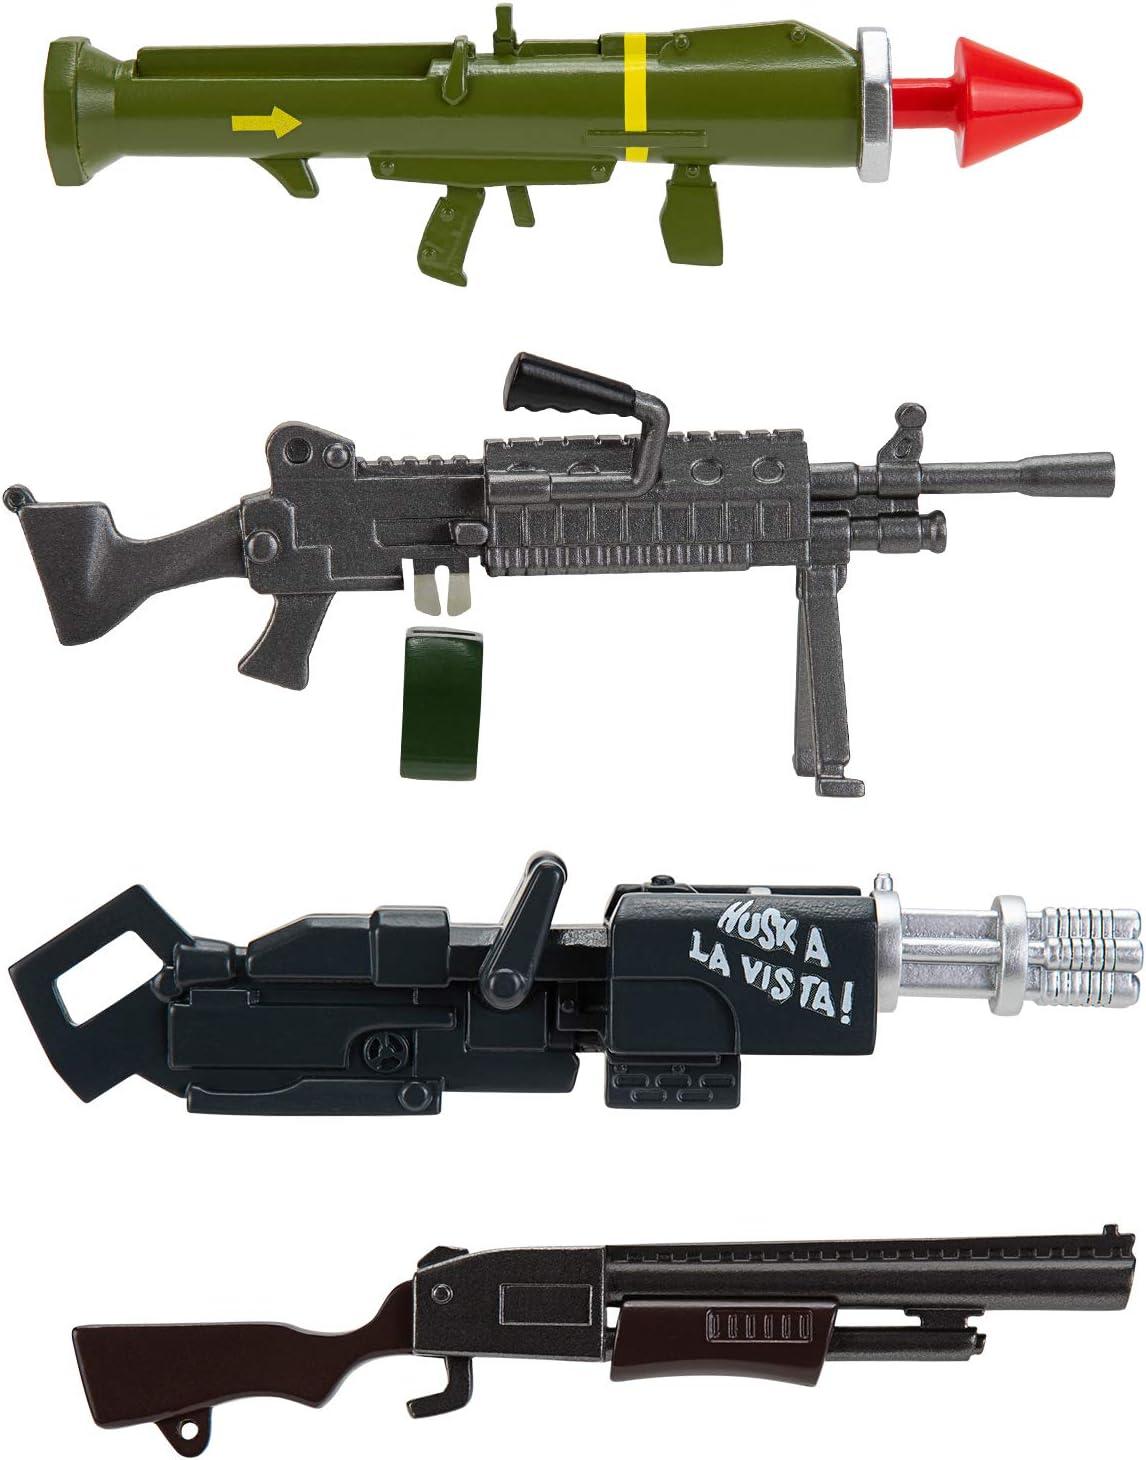 Art Hub Fortnite Guns Amazon Com Fortnite Legednary Loadout Weapons Legendary Series Set S1 Fnt0110 Toys Games